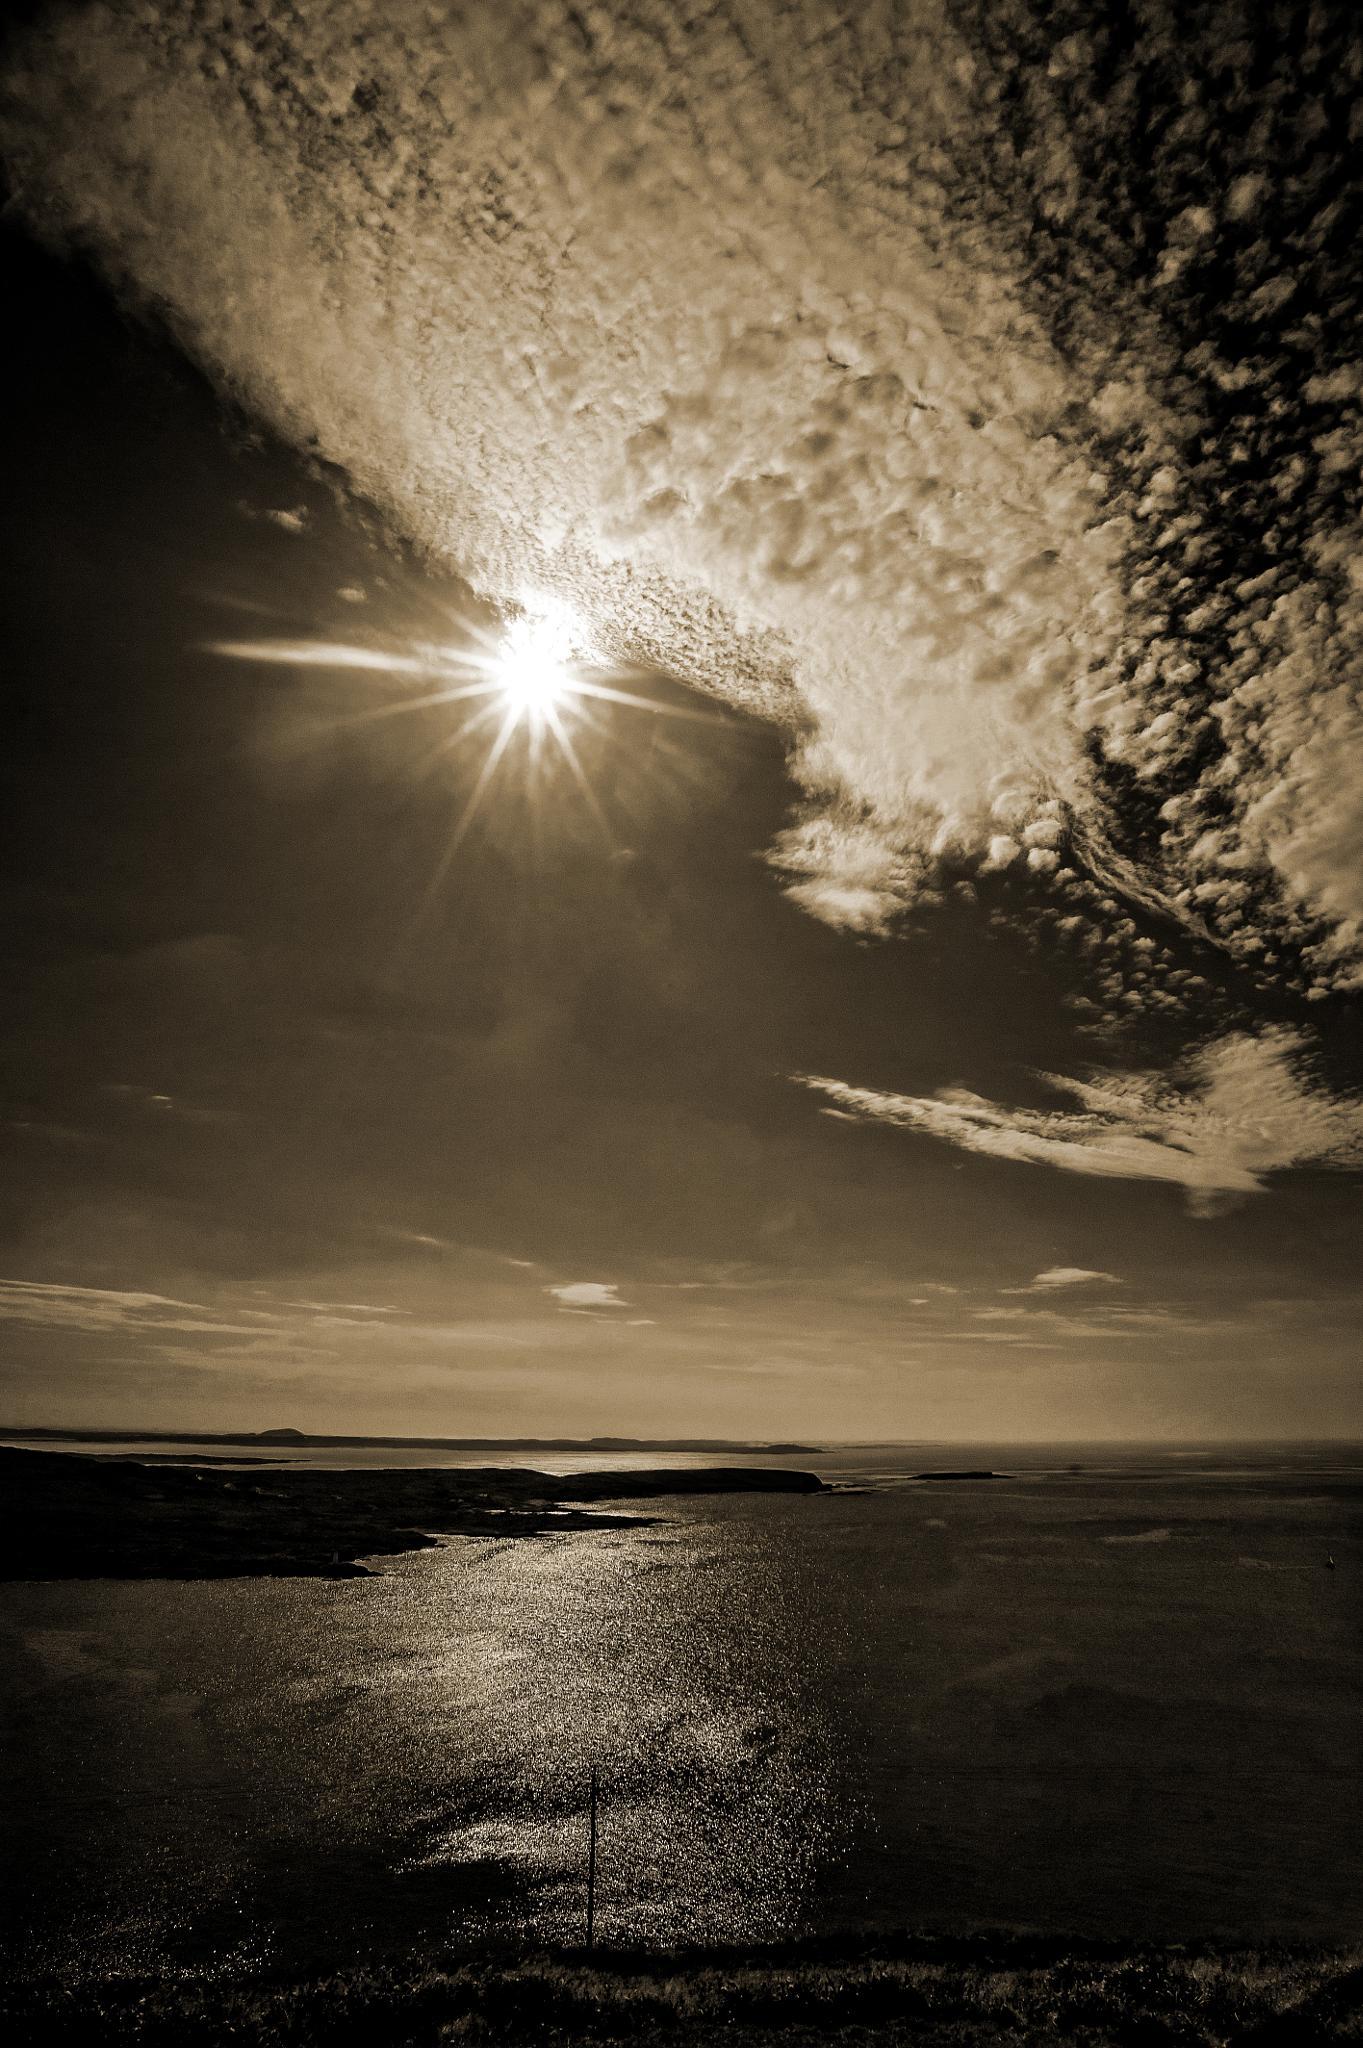 Sunny side  by Gerard Kievits